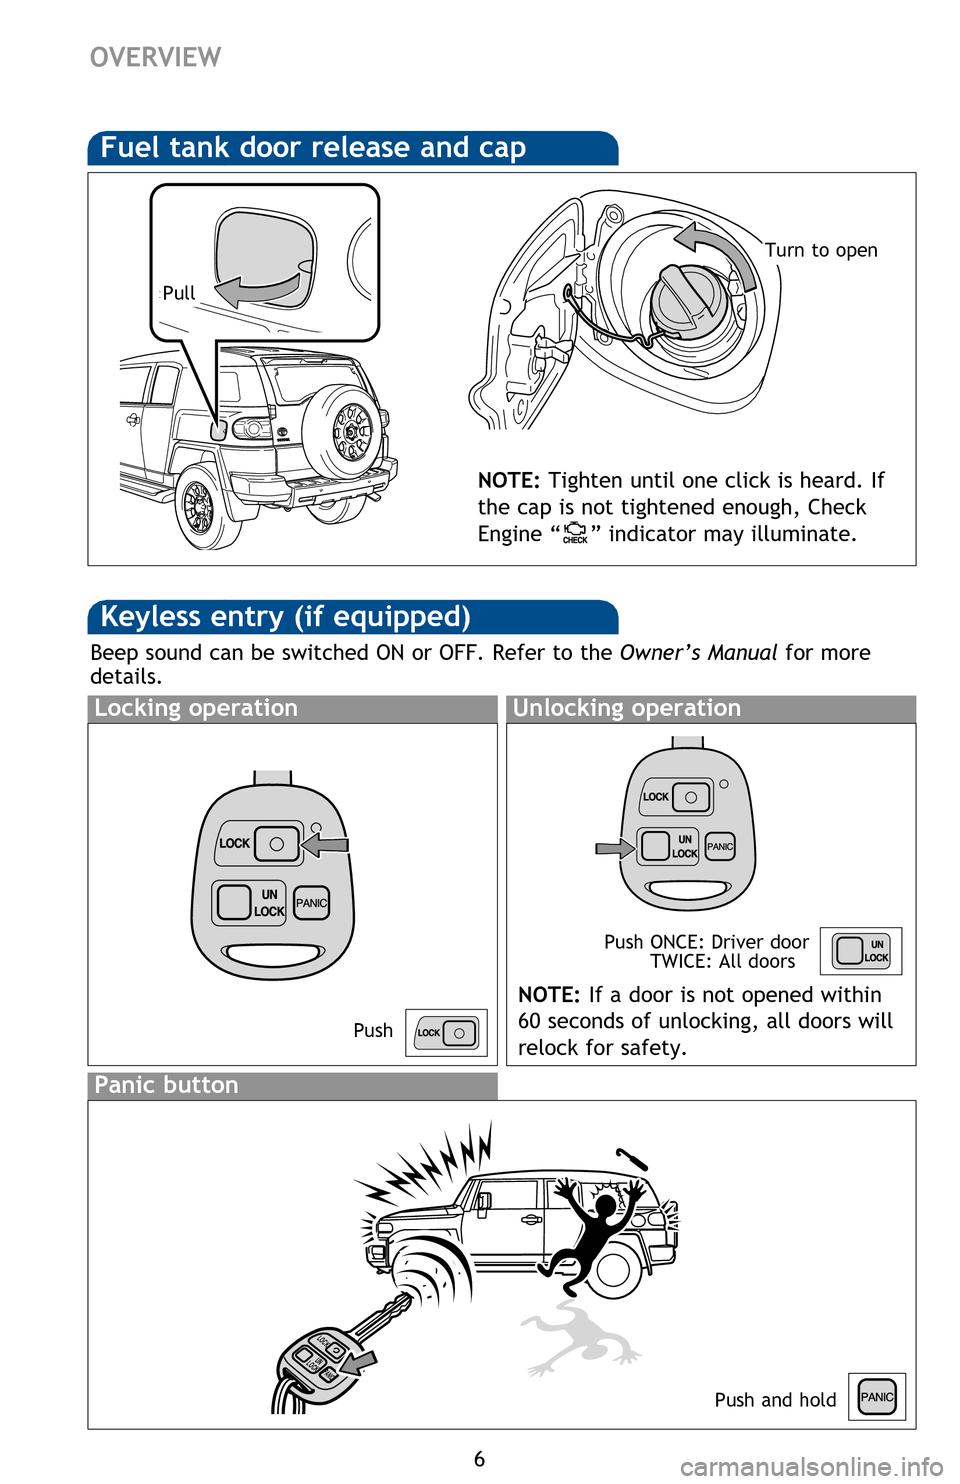 wiring harness for fj cruiser